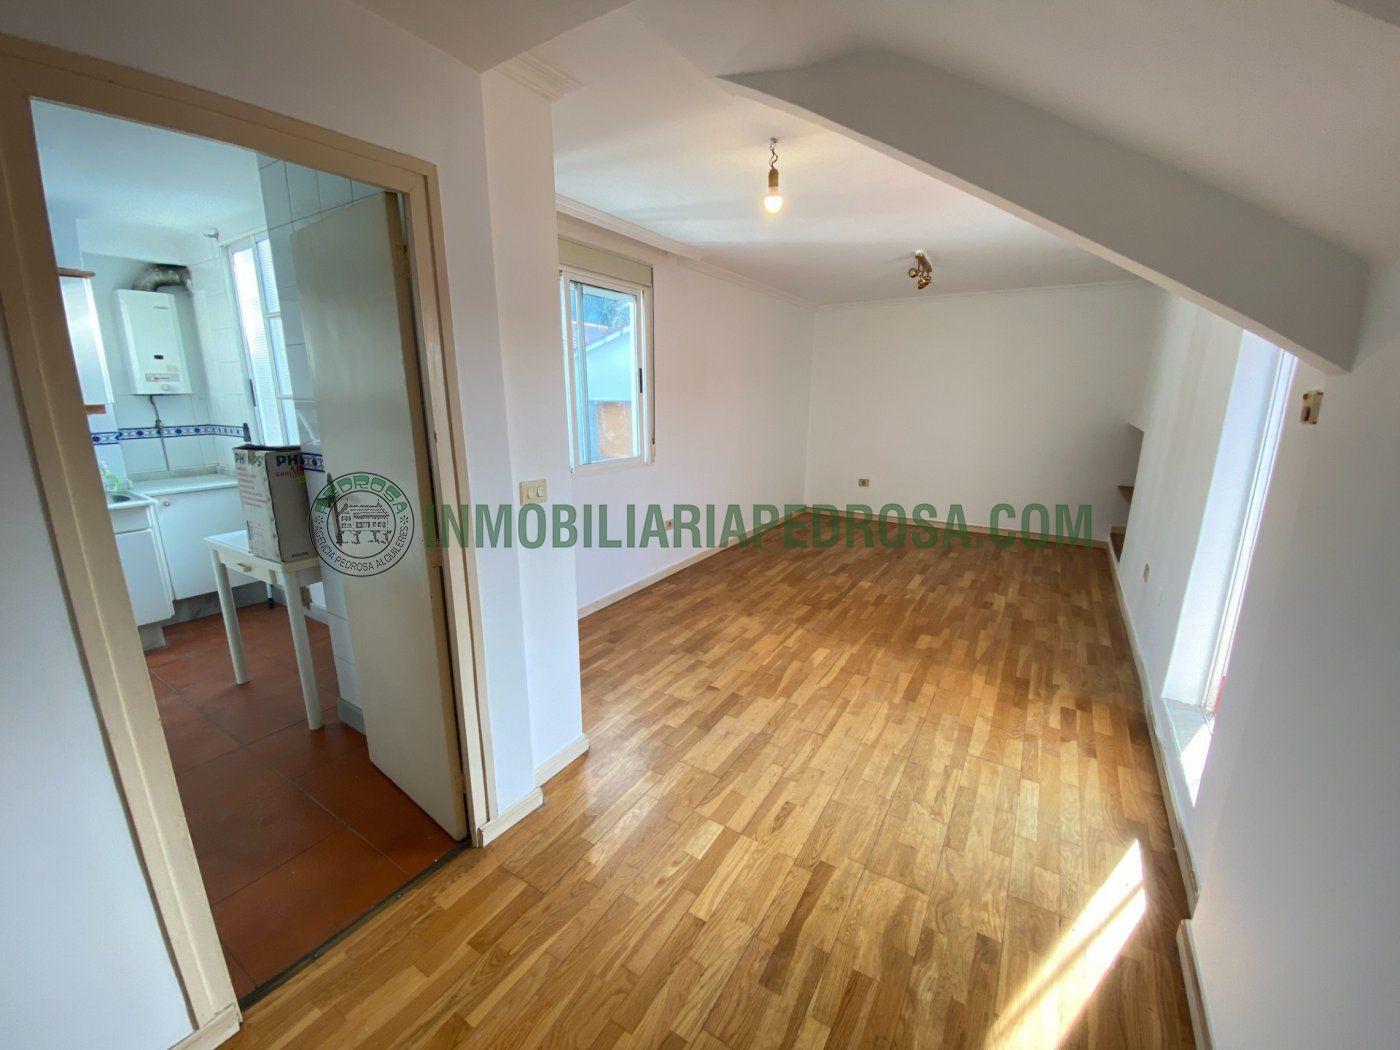 Apartamento, Zona monumental, Venta - Pontevedra (Pontevedra)